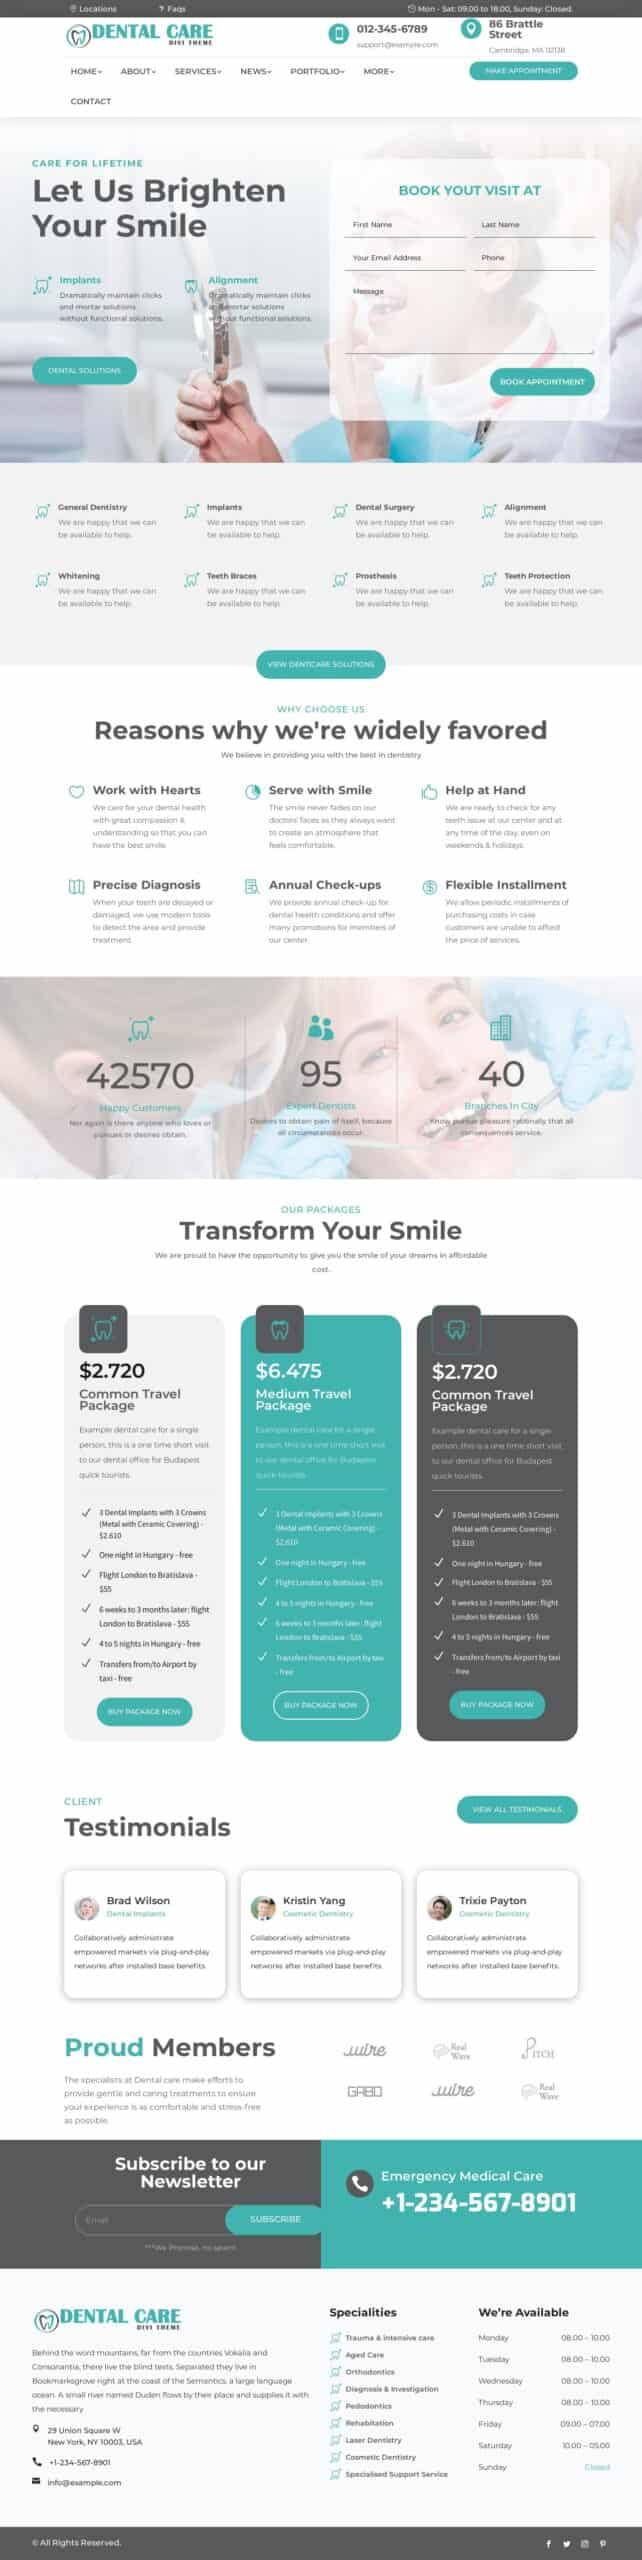 Ejemplo Dental Care